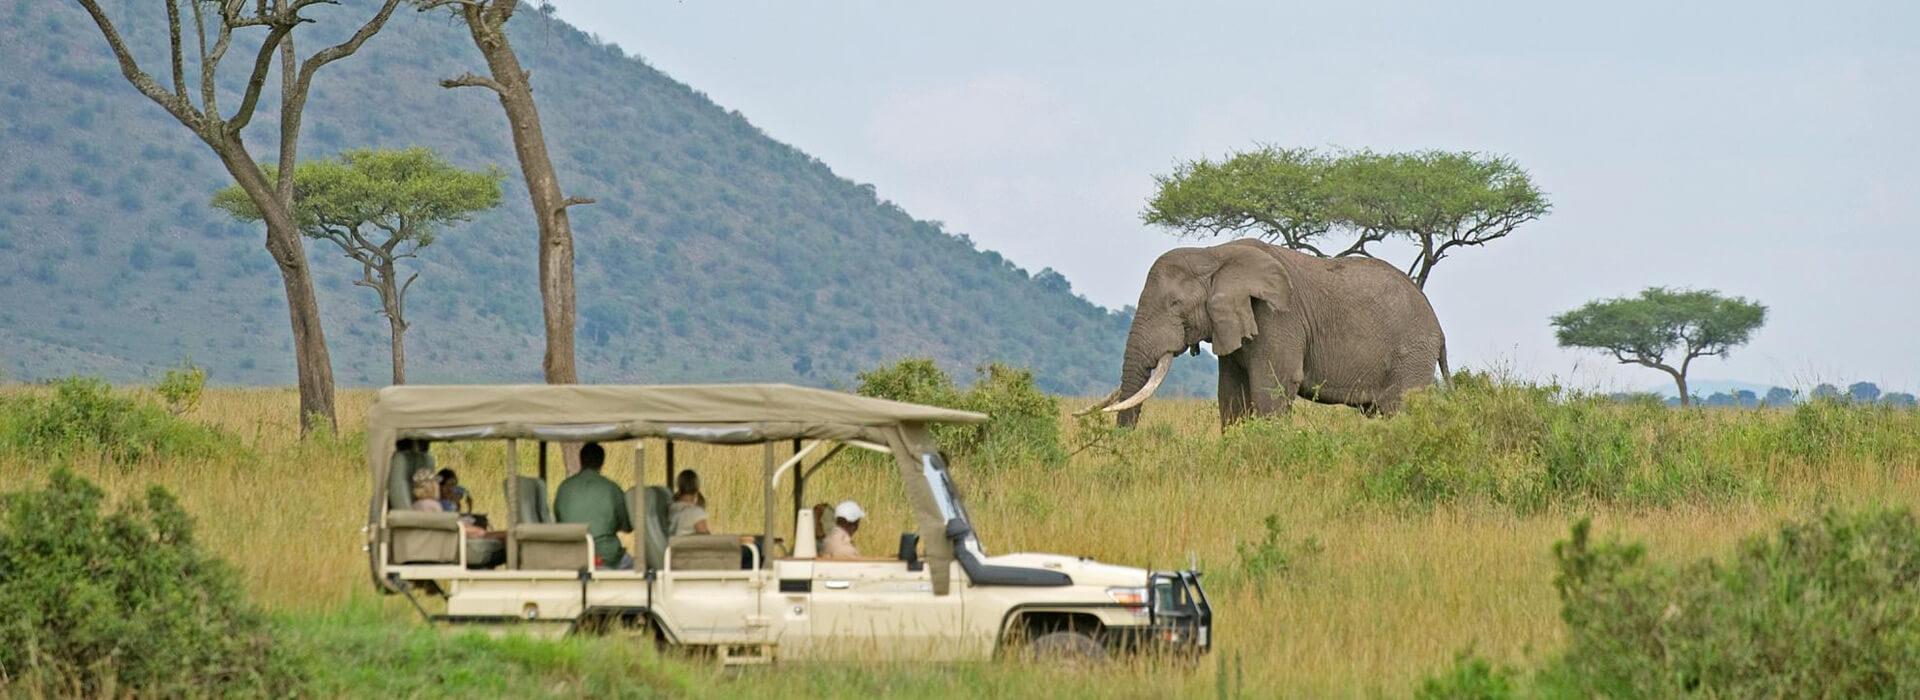 kenya safari tours, kenya tours, kenya safari, masai mara great migration